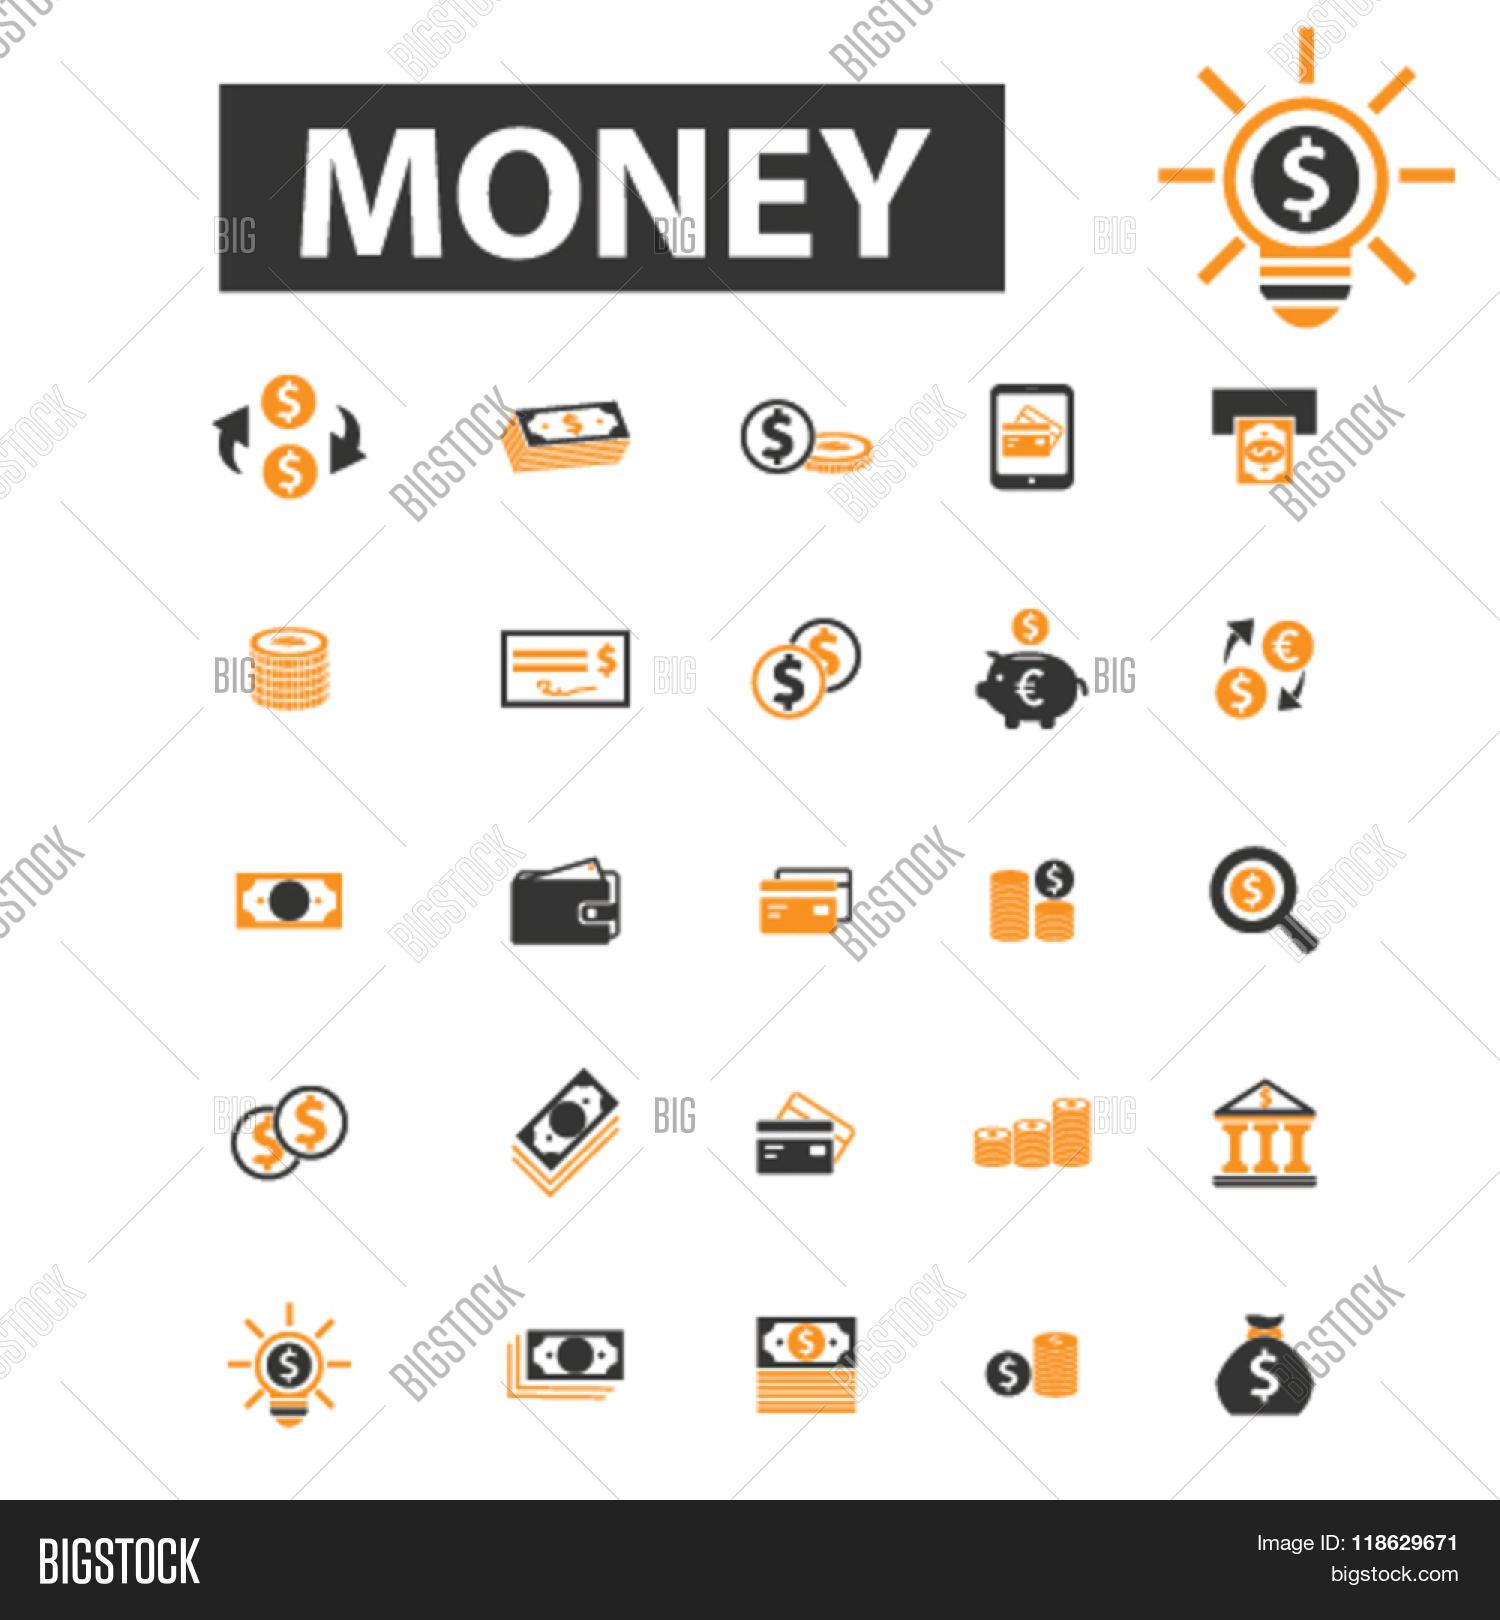 Cash Icons, Cash Logo, Money Icons Vector & Photo | Bigstock